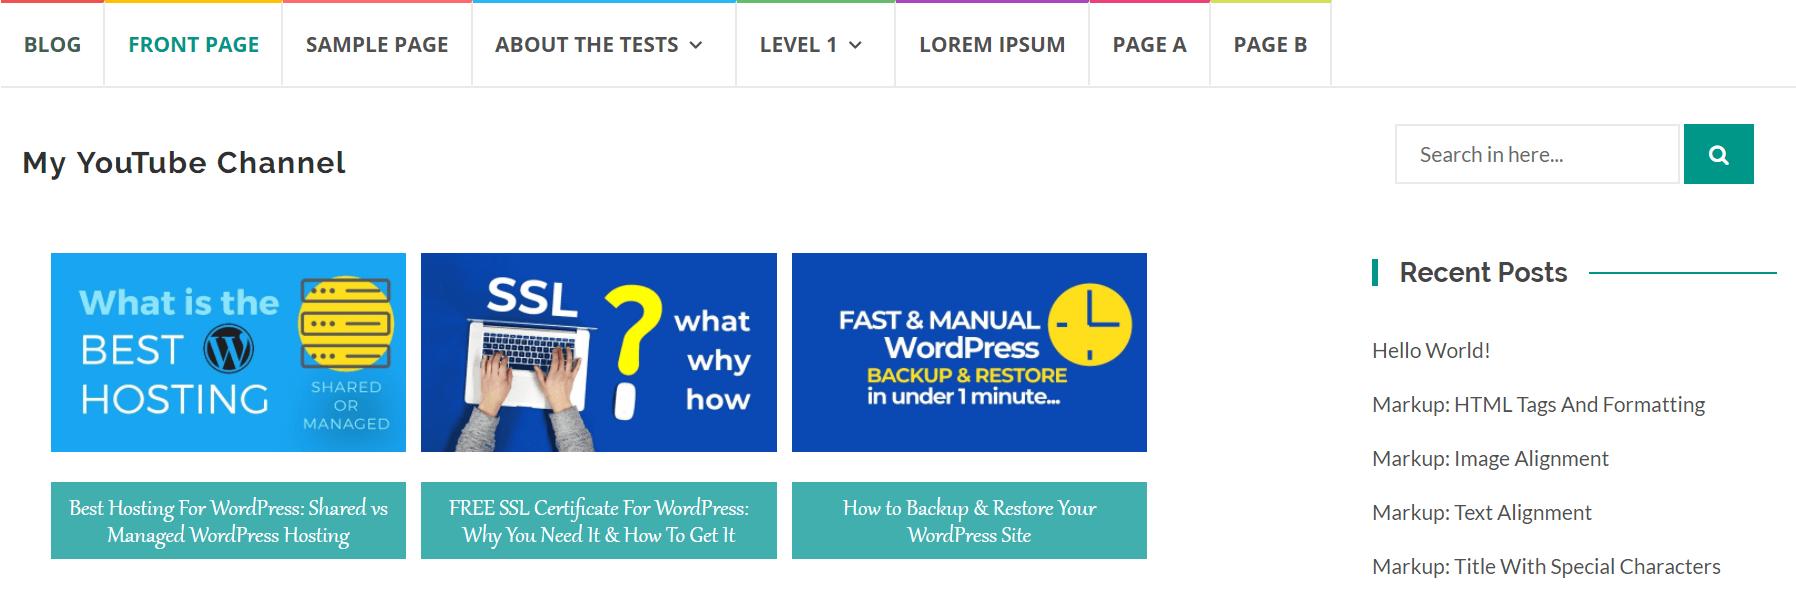 WordPress页面上显示的YouTube图库。